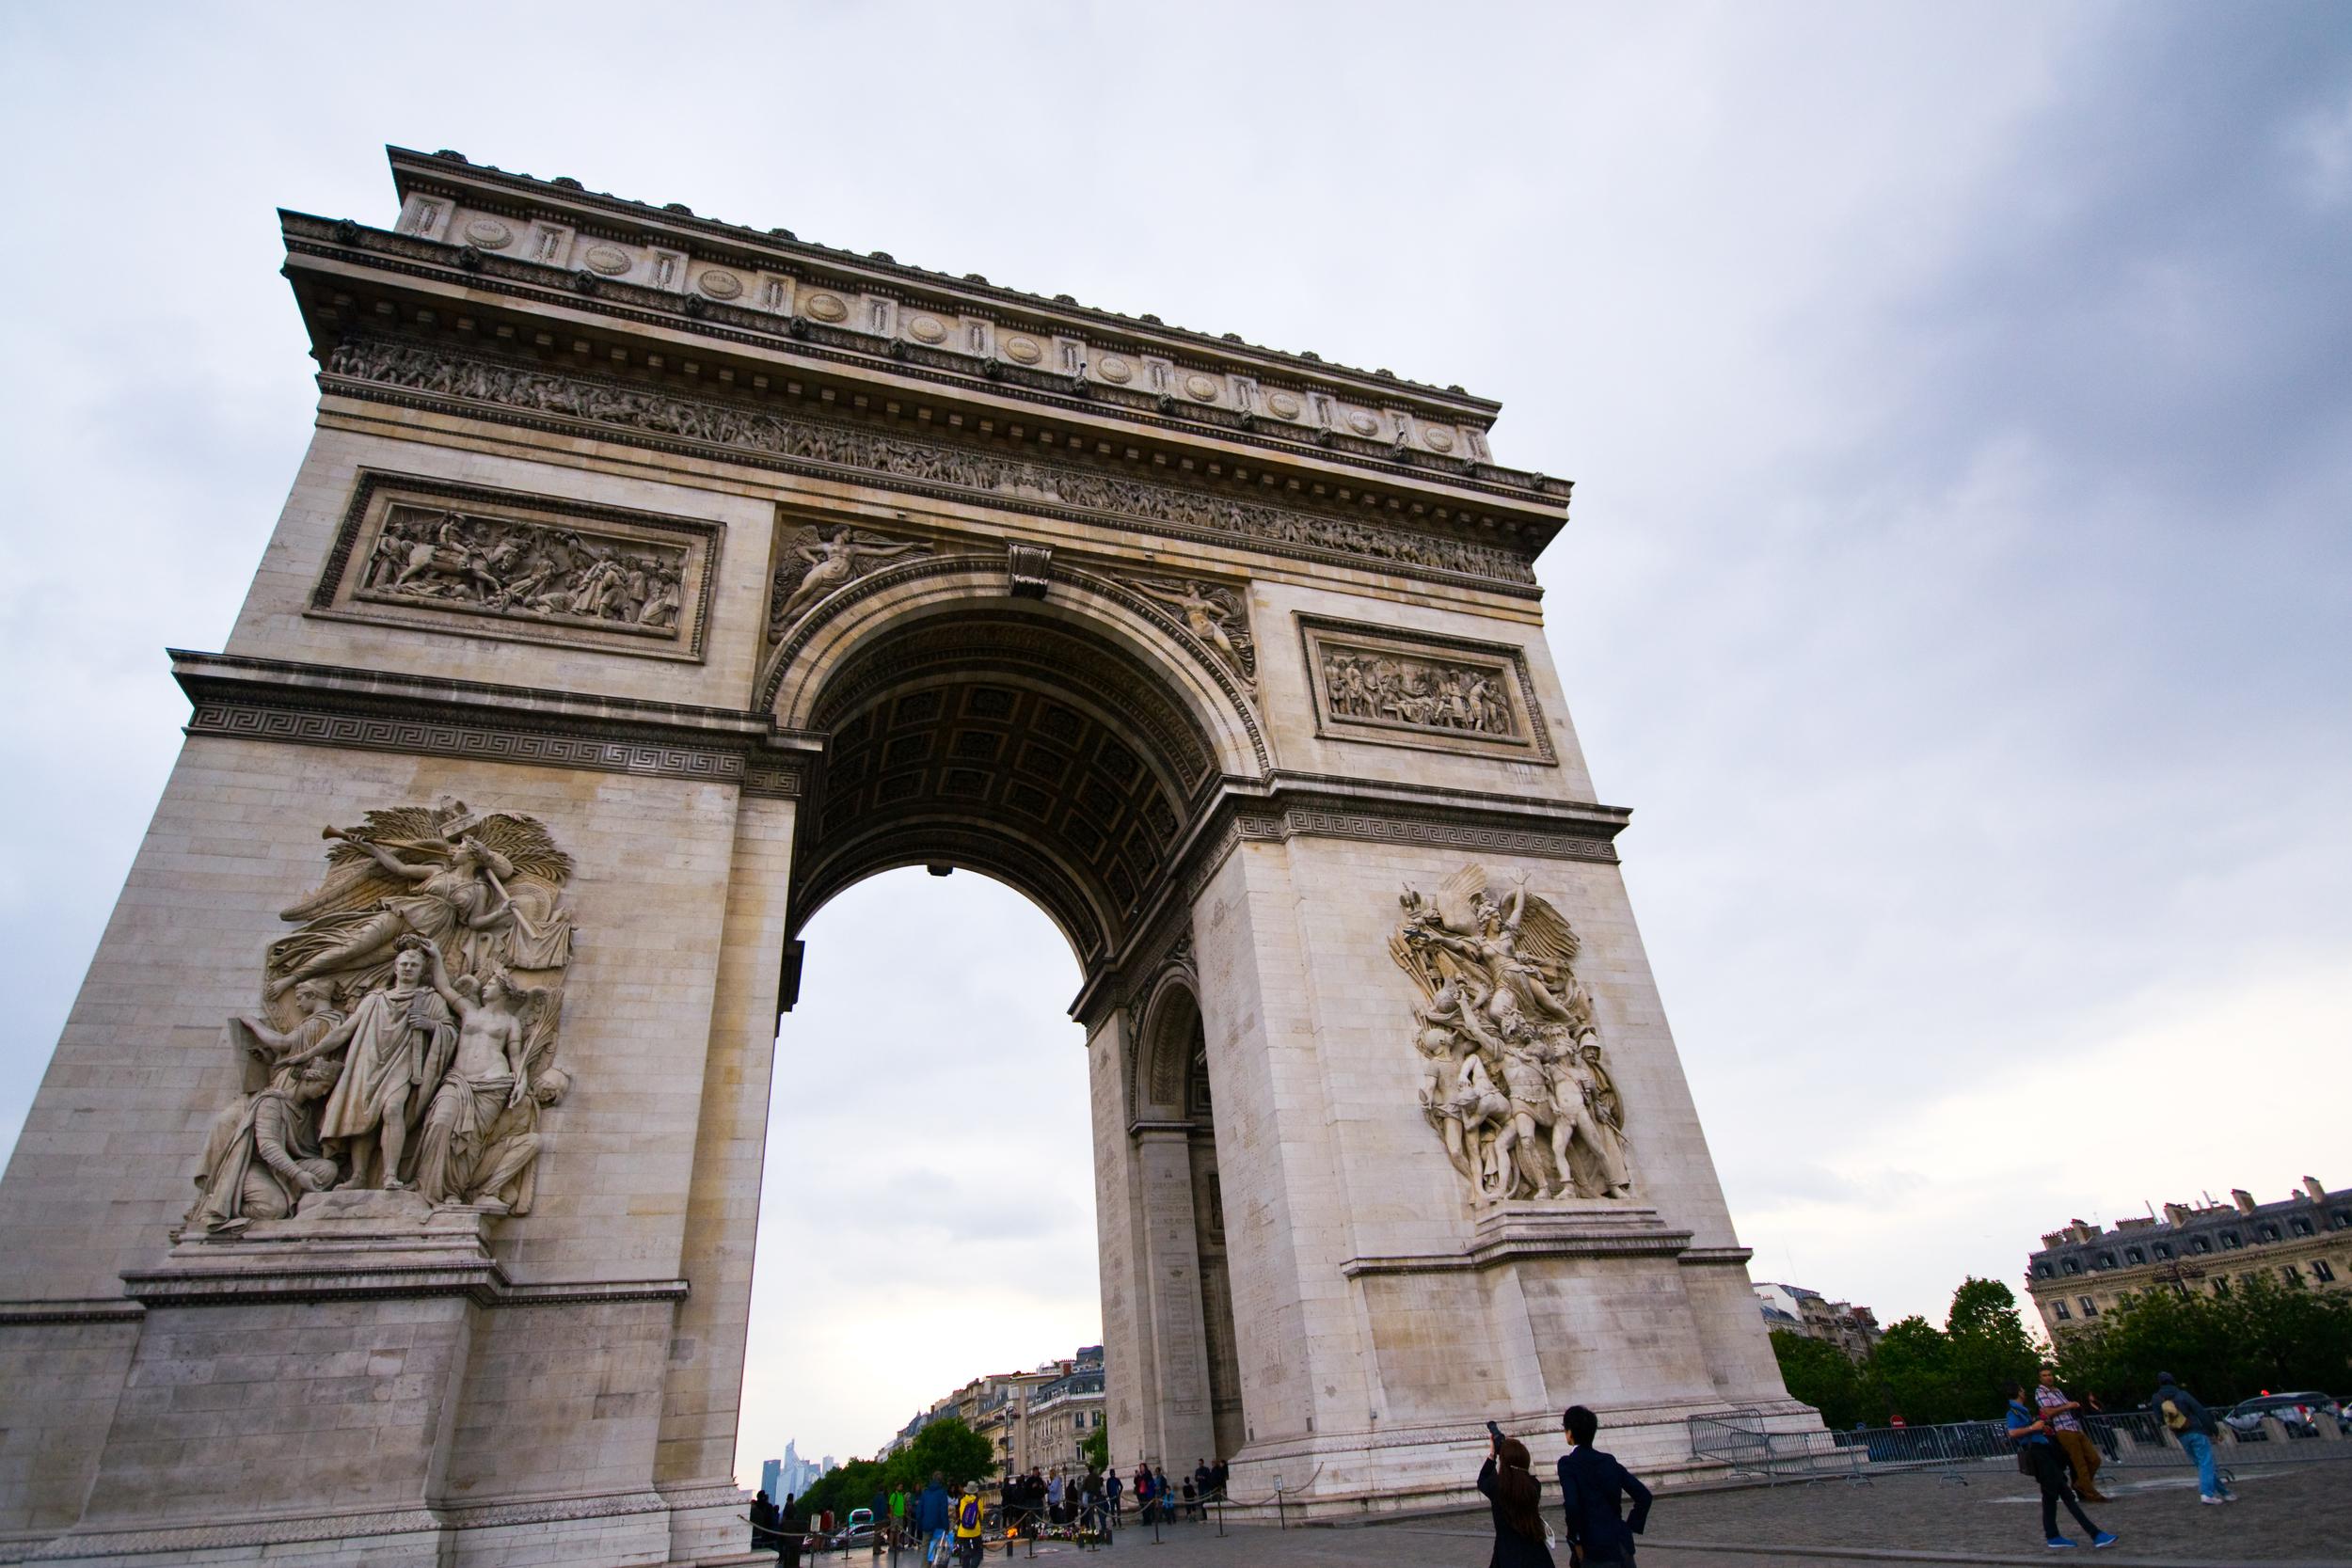 Paris, France by Charuk Studios